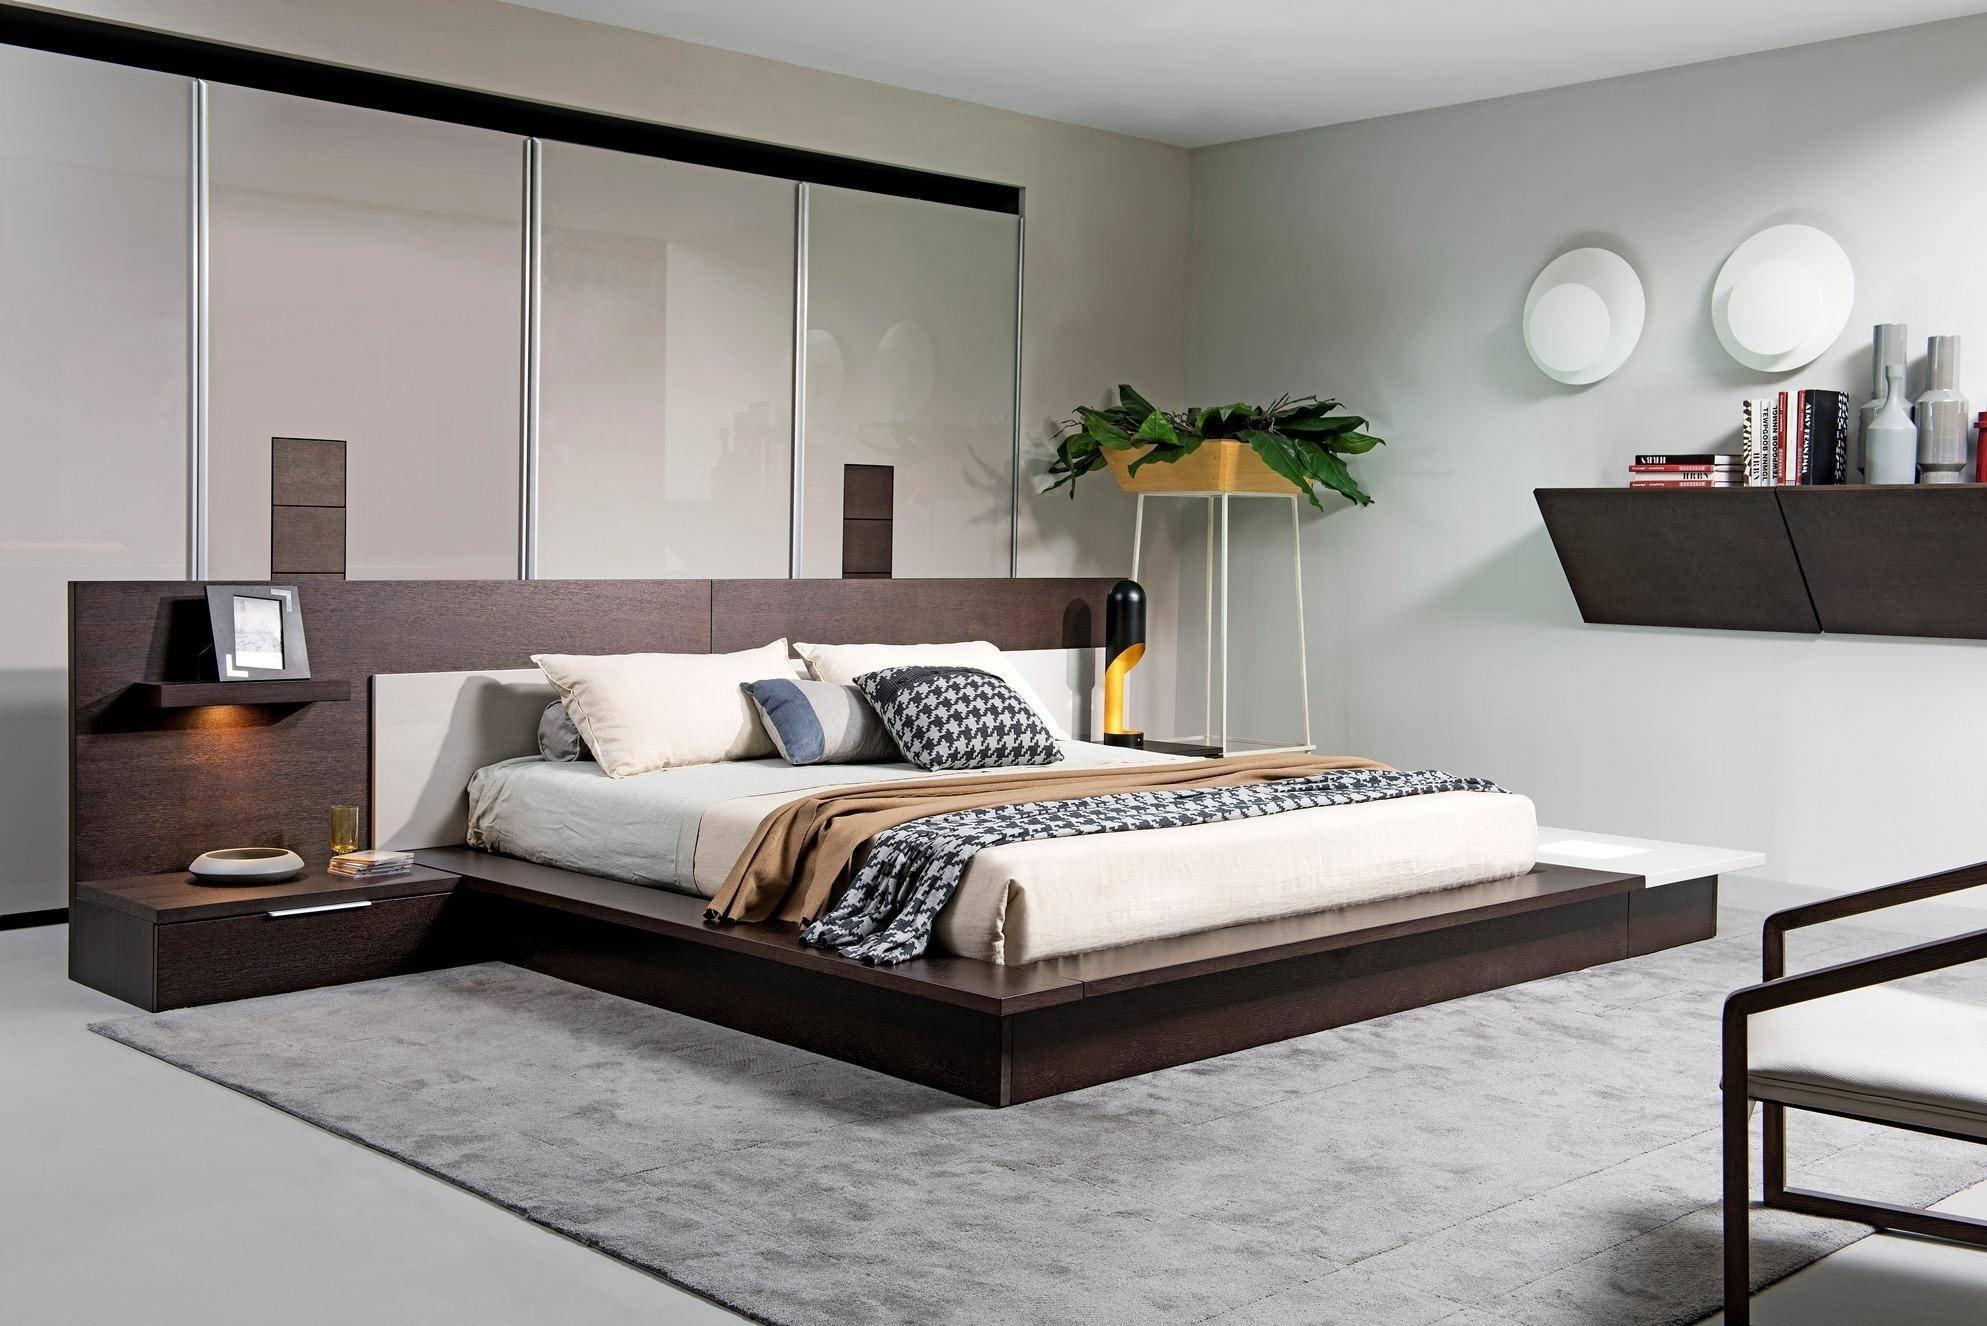 Gray and Brown Bedroom Lovely Vig Modrest torino Brown Oak Grey Queen Bed W Lights Built